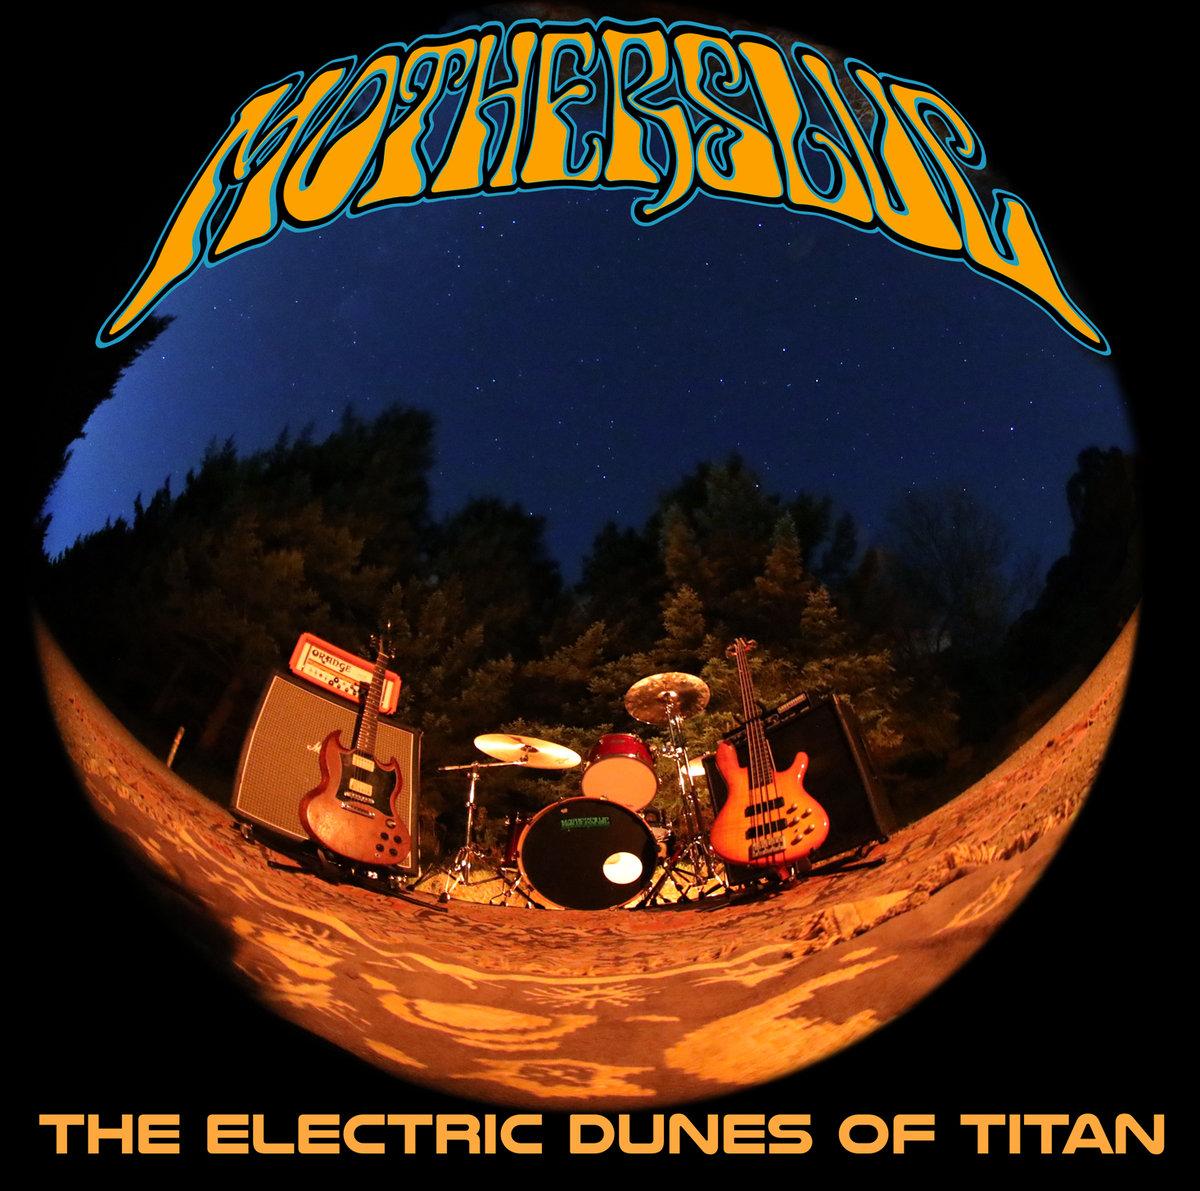 motherslug the electric dunes of titan